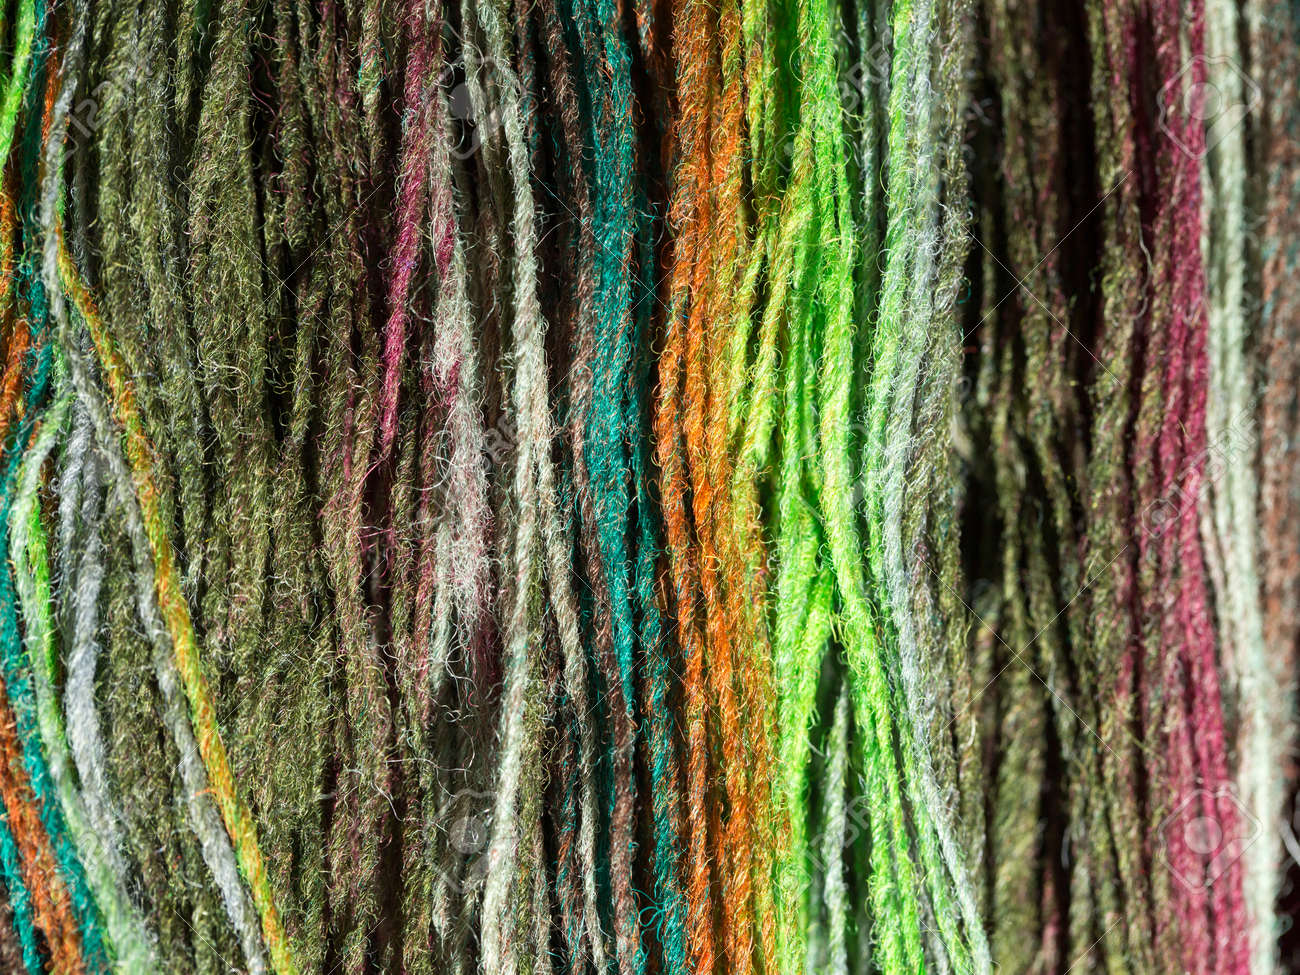 Yarn from natural natural material in various colors - 168930461